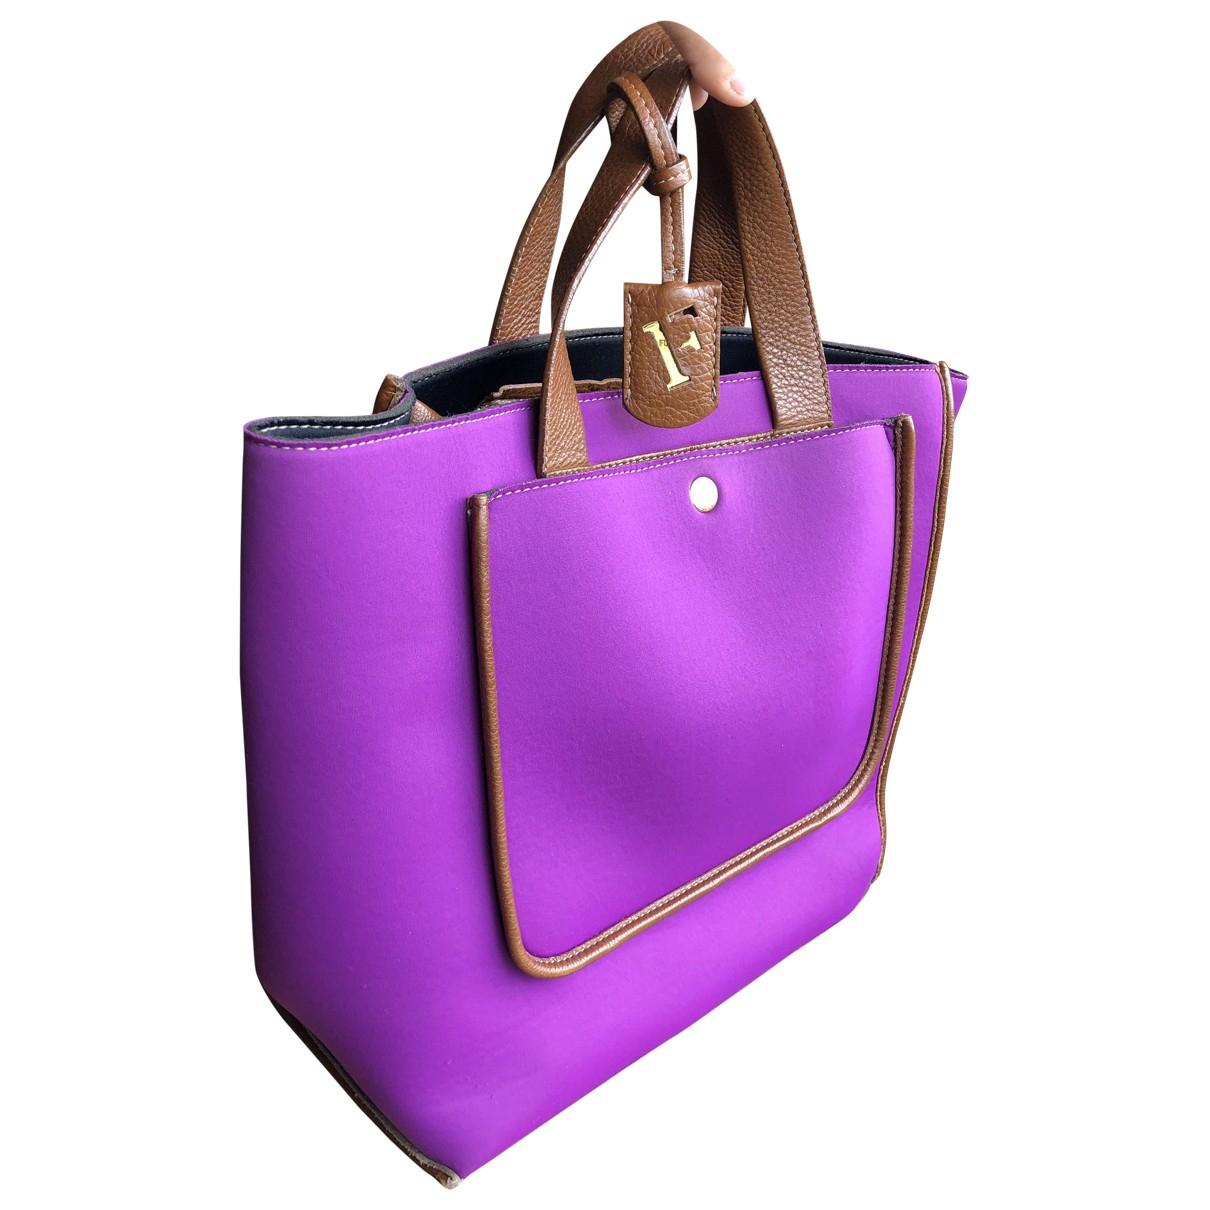 Furla \N Handtasche in  Lila Synthetik